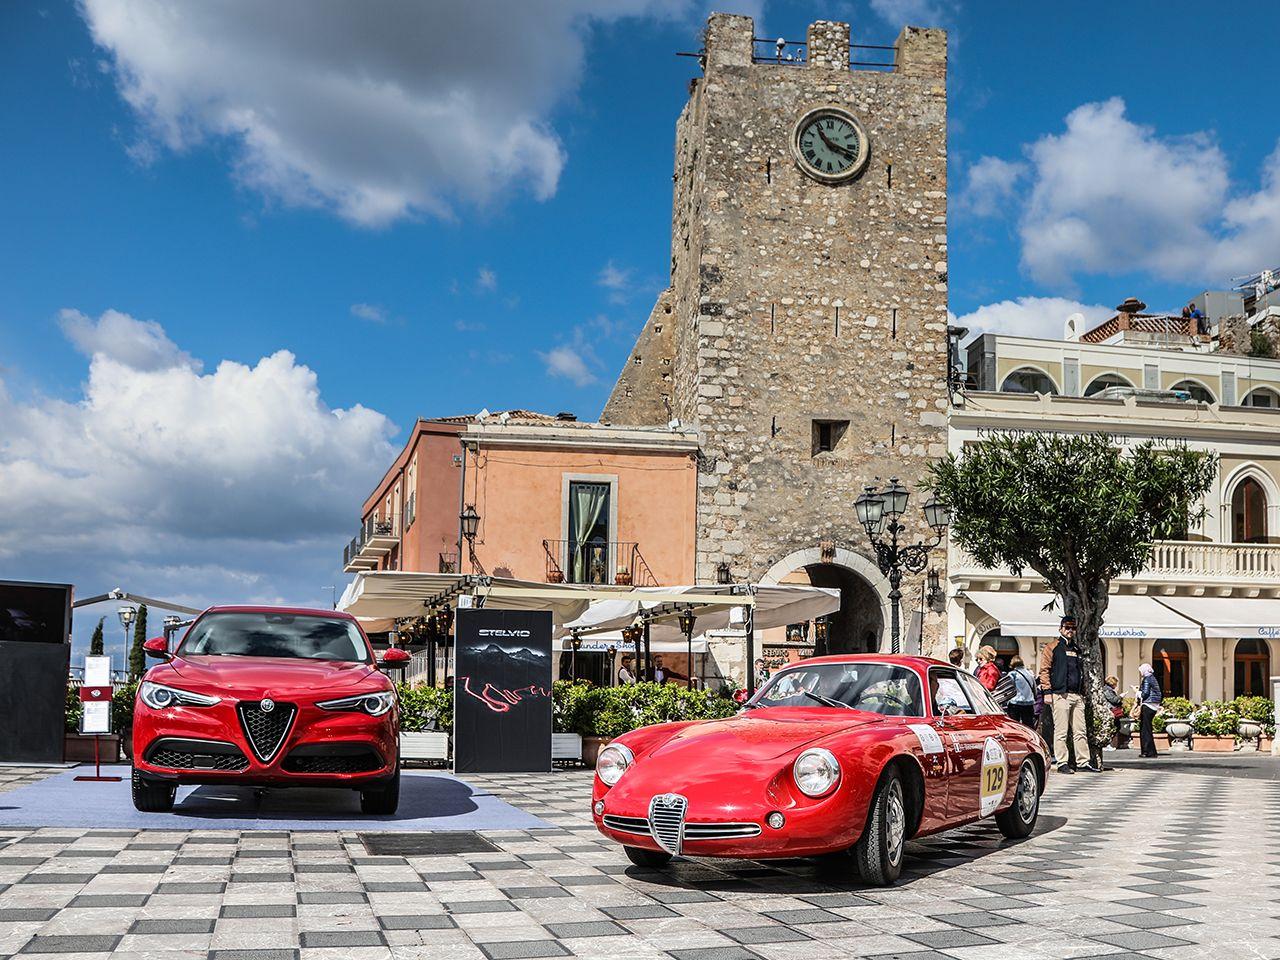 170422 Alfa Romeo On Air 02 Ο πρώτος γύρος στο Targa Florio 2017: από την Taormina στην Cefalù Alfa, alfa romeo, Alfa Romeo Giulia, Alfa Romeo Giulia GTA, Alfa Romeo Giulietta, Alfa Romeo Giulietta SZ, Classic, Targa Florio, videos, αγωνες